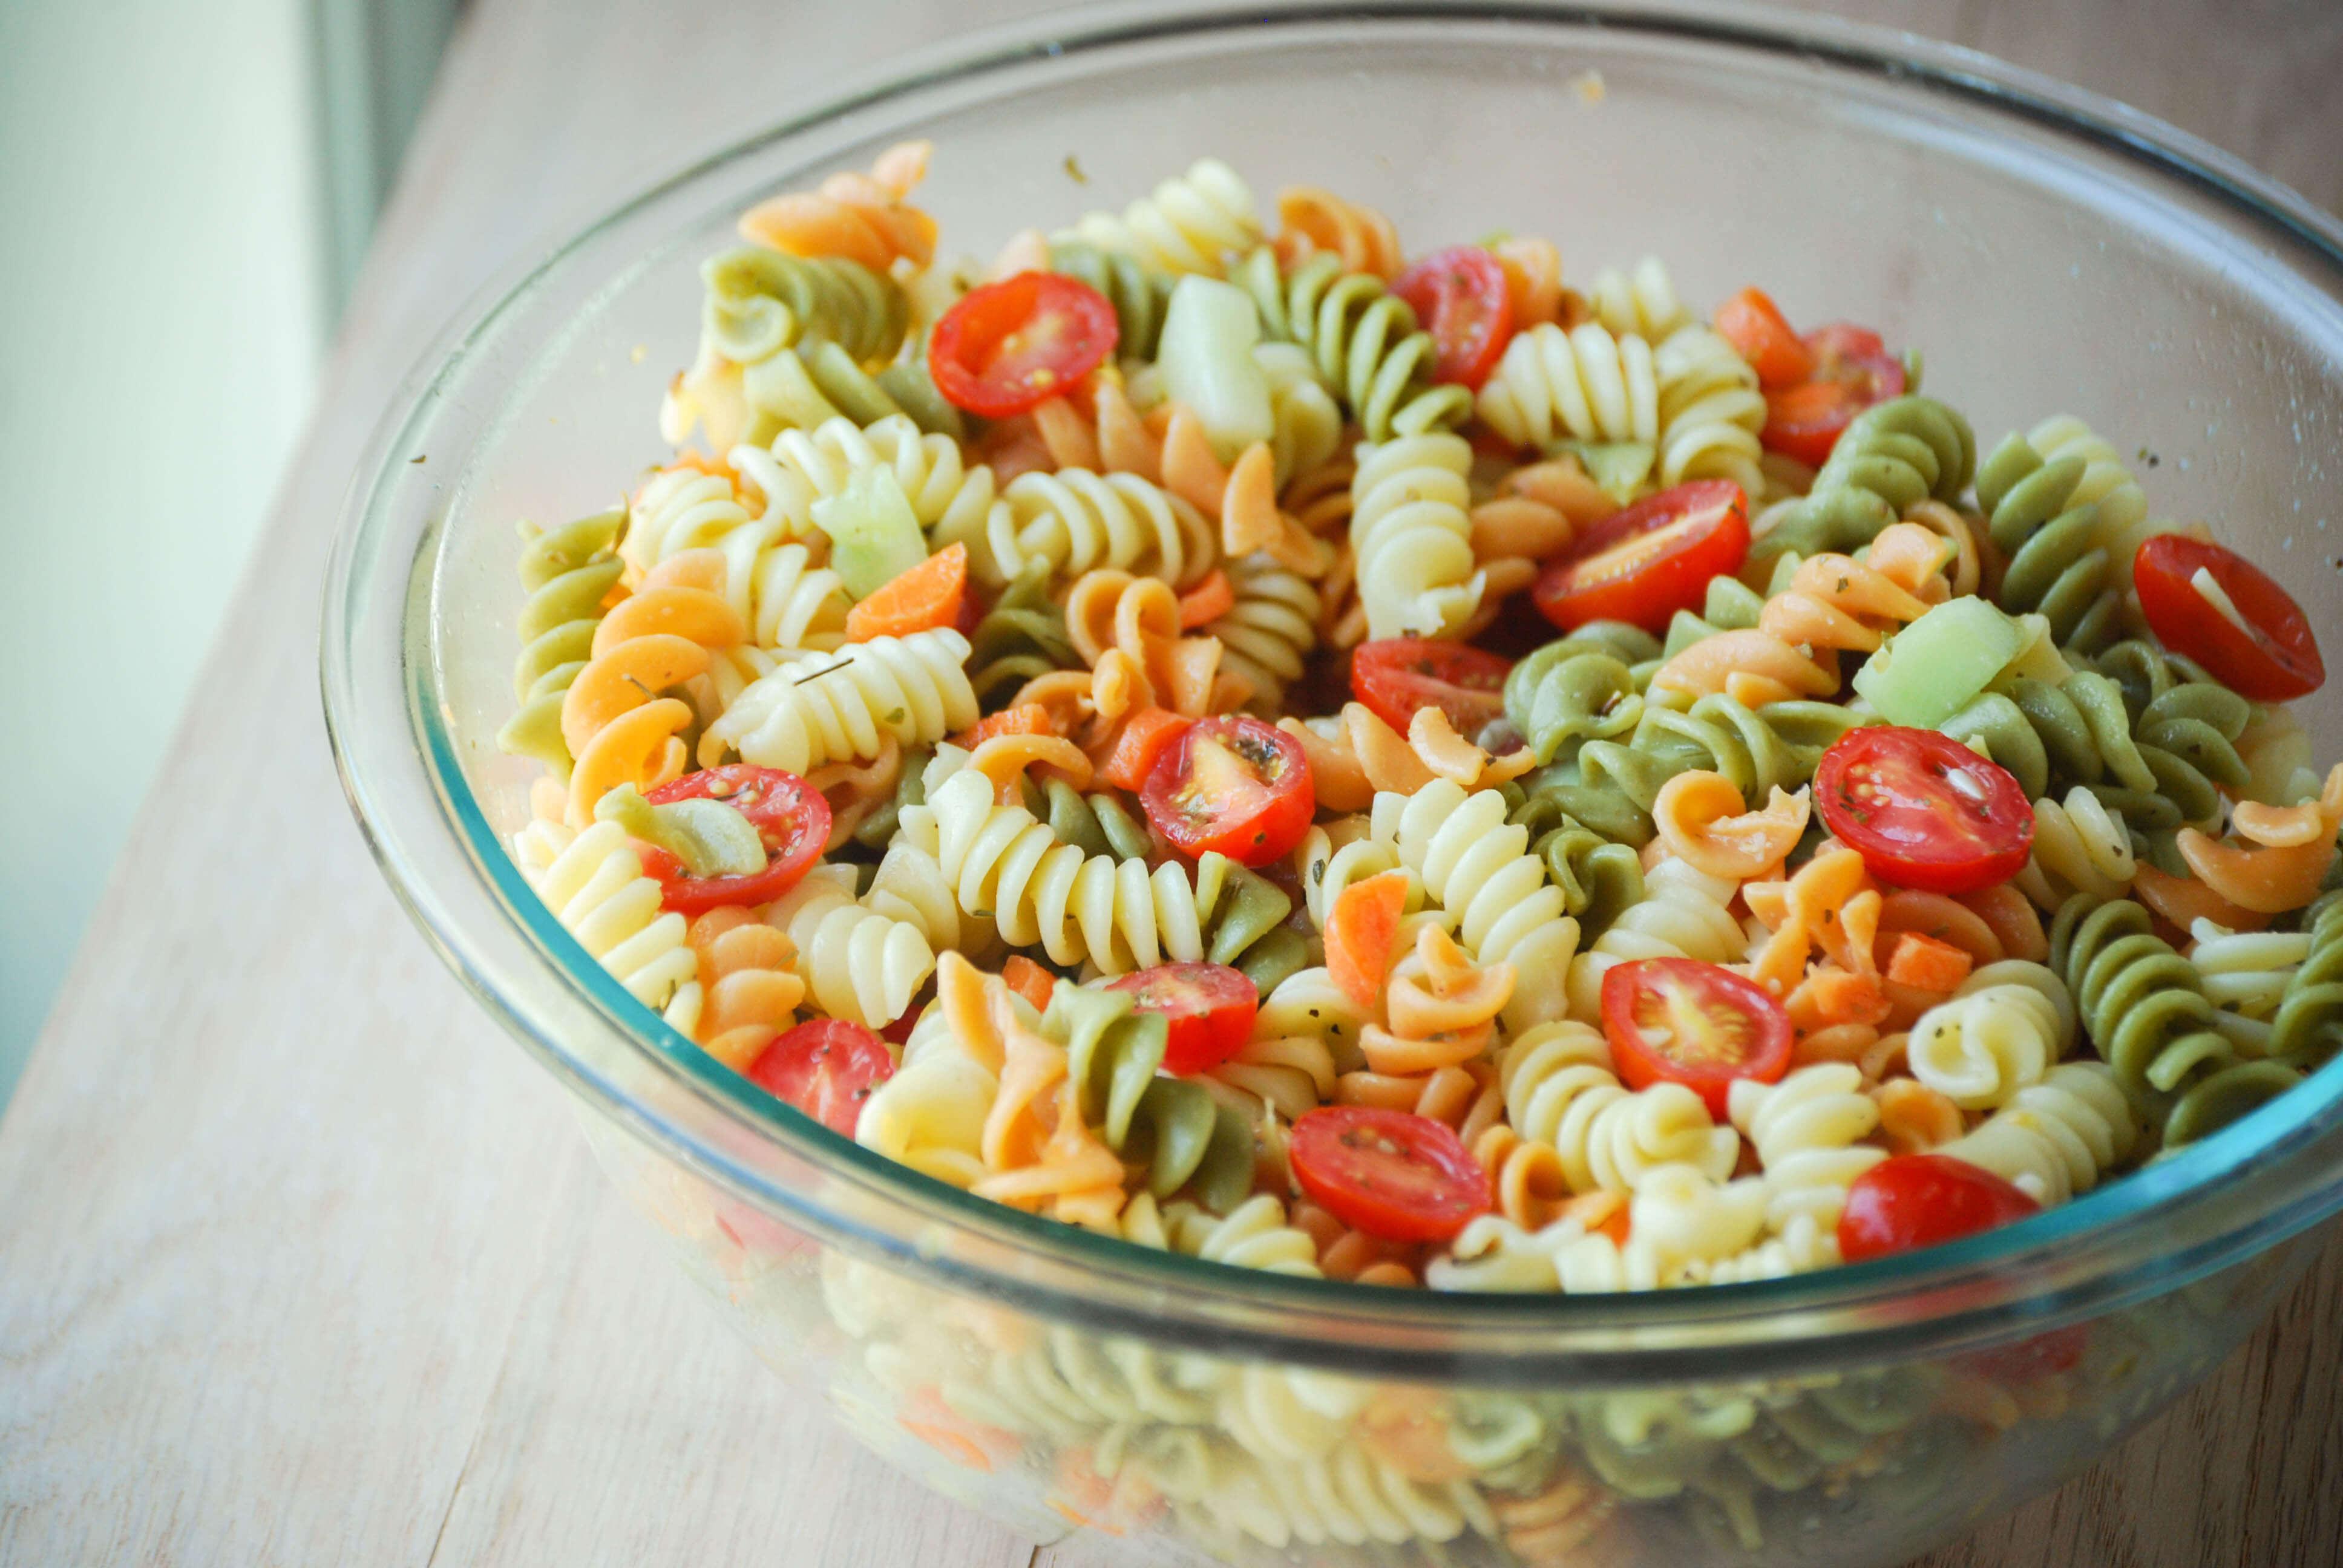 Mengapa Diet Rendah Karbohidrat itu Sehat?